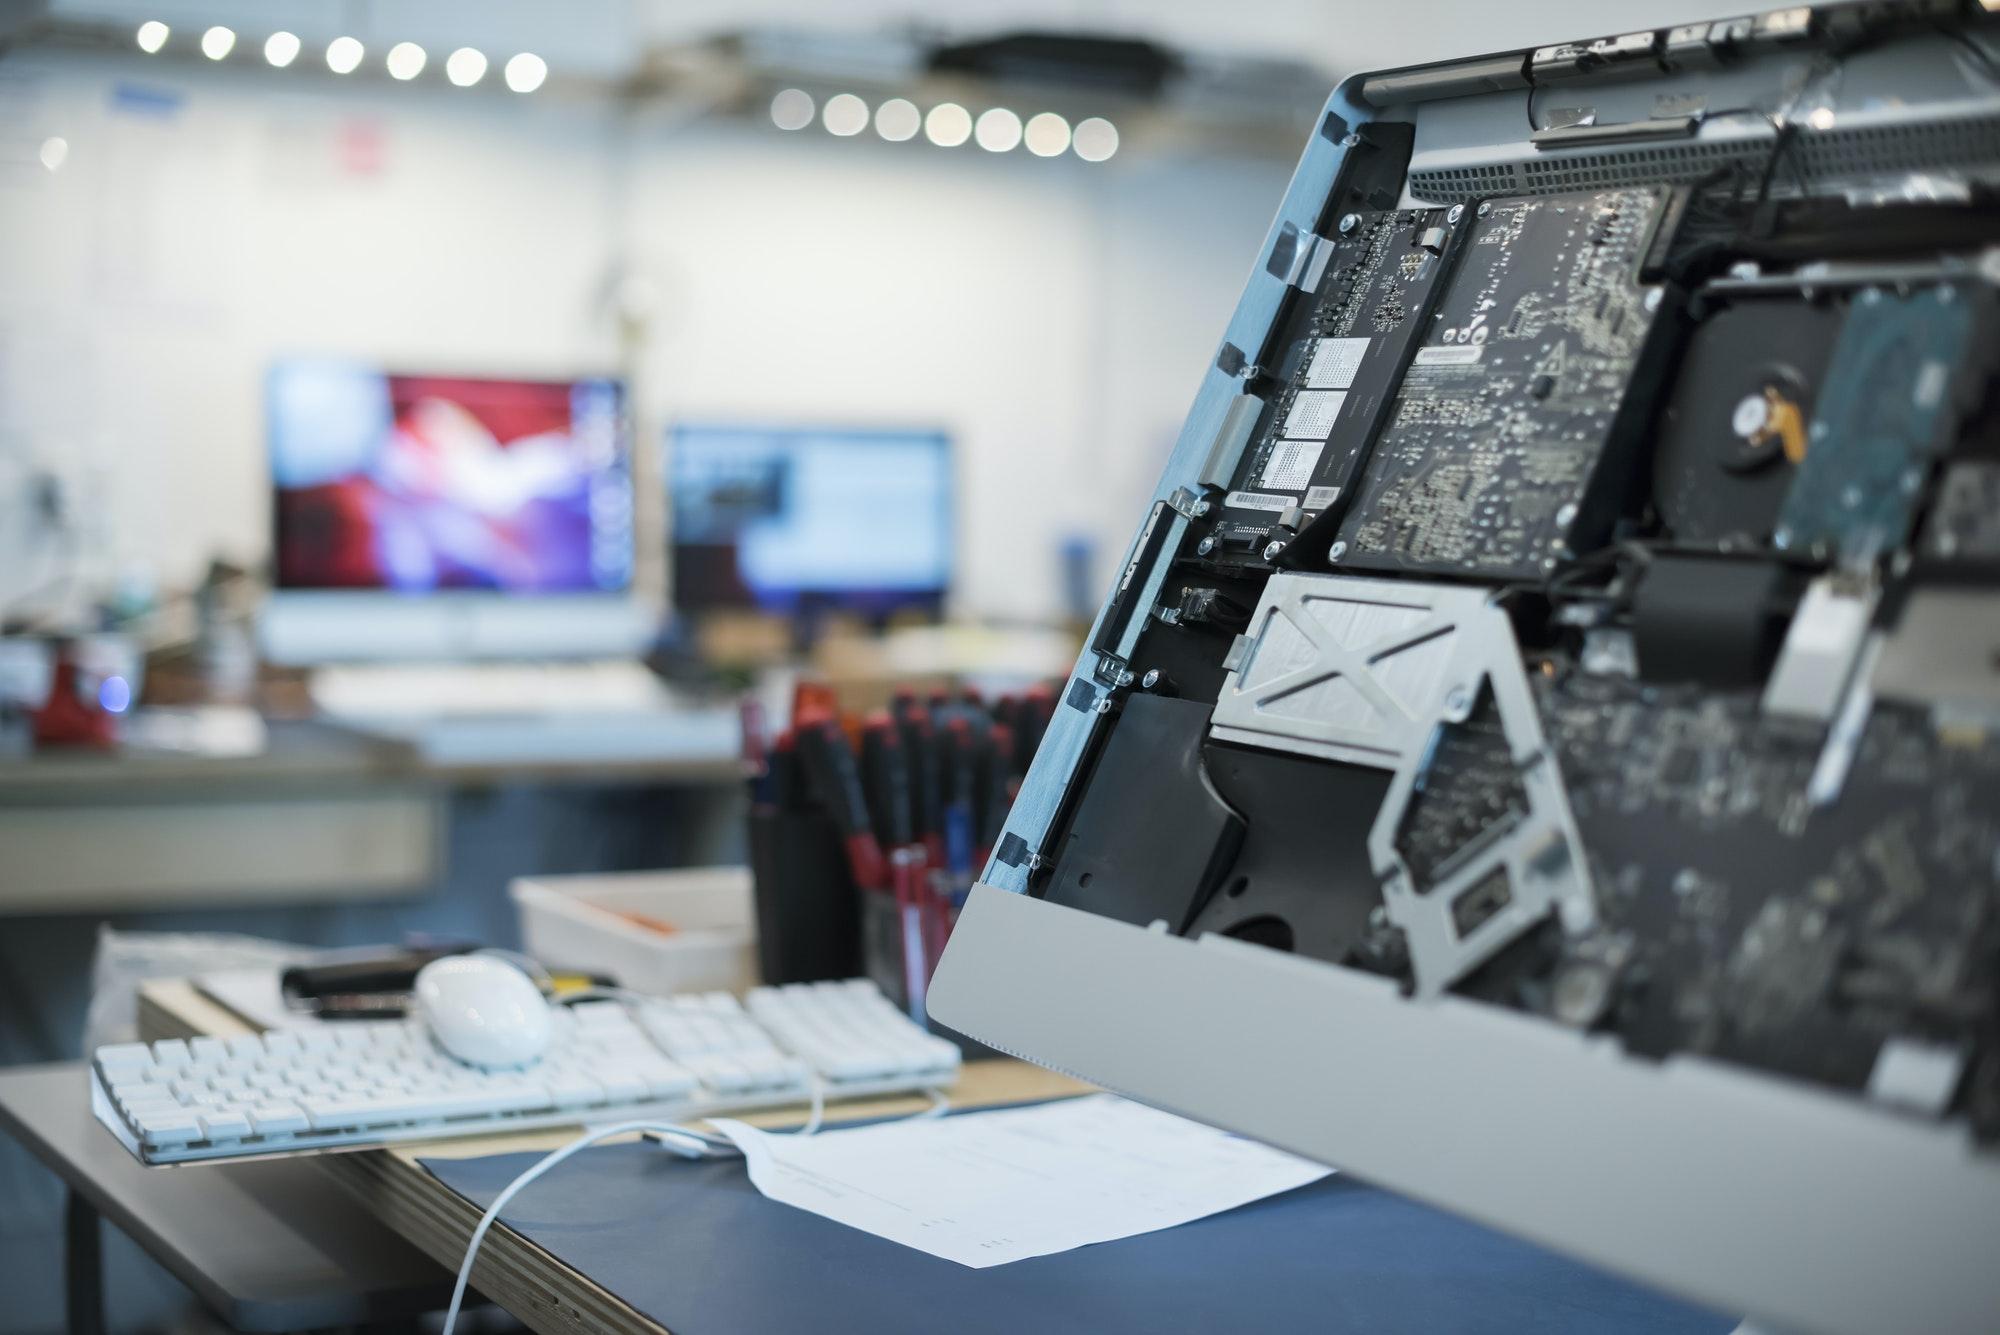 Computer Repair Shop. Circuit boards and computer parts.